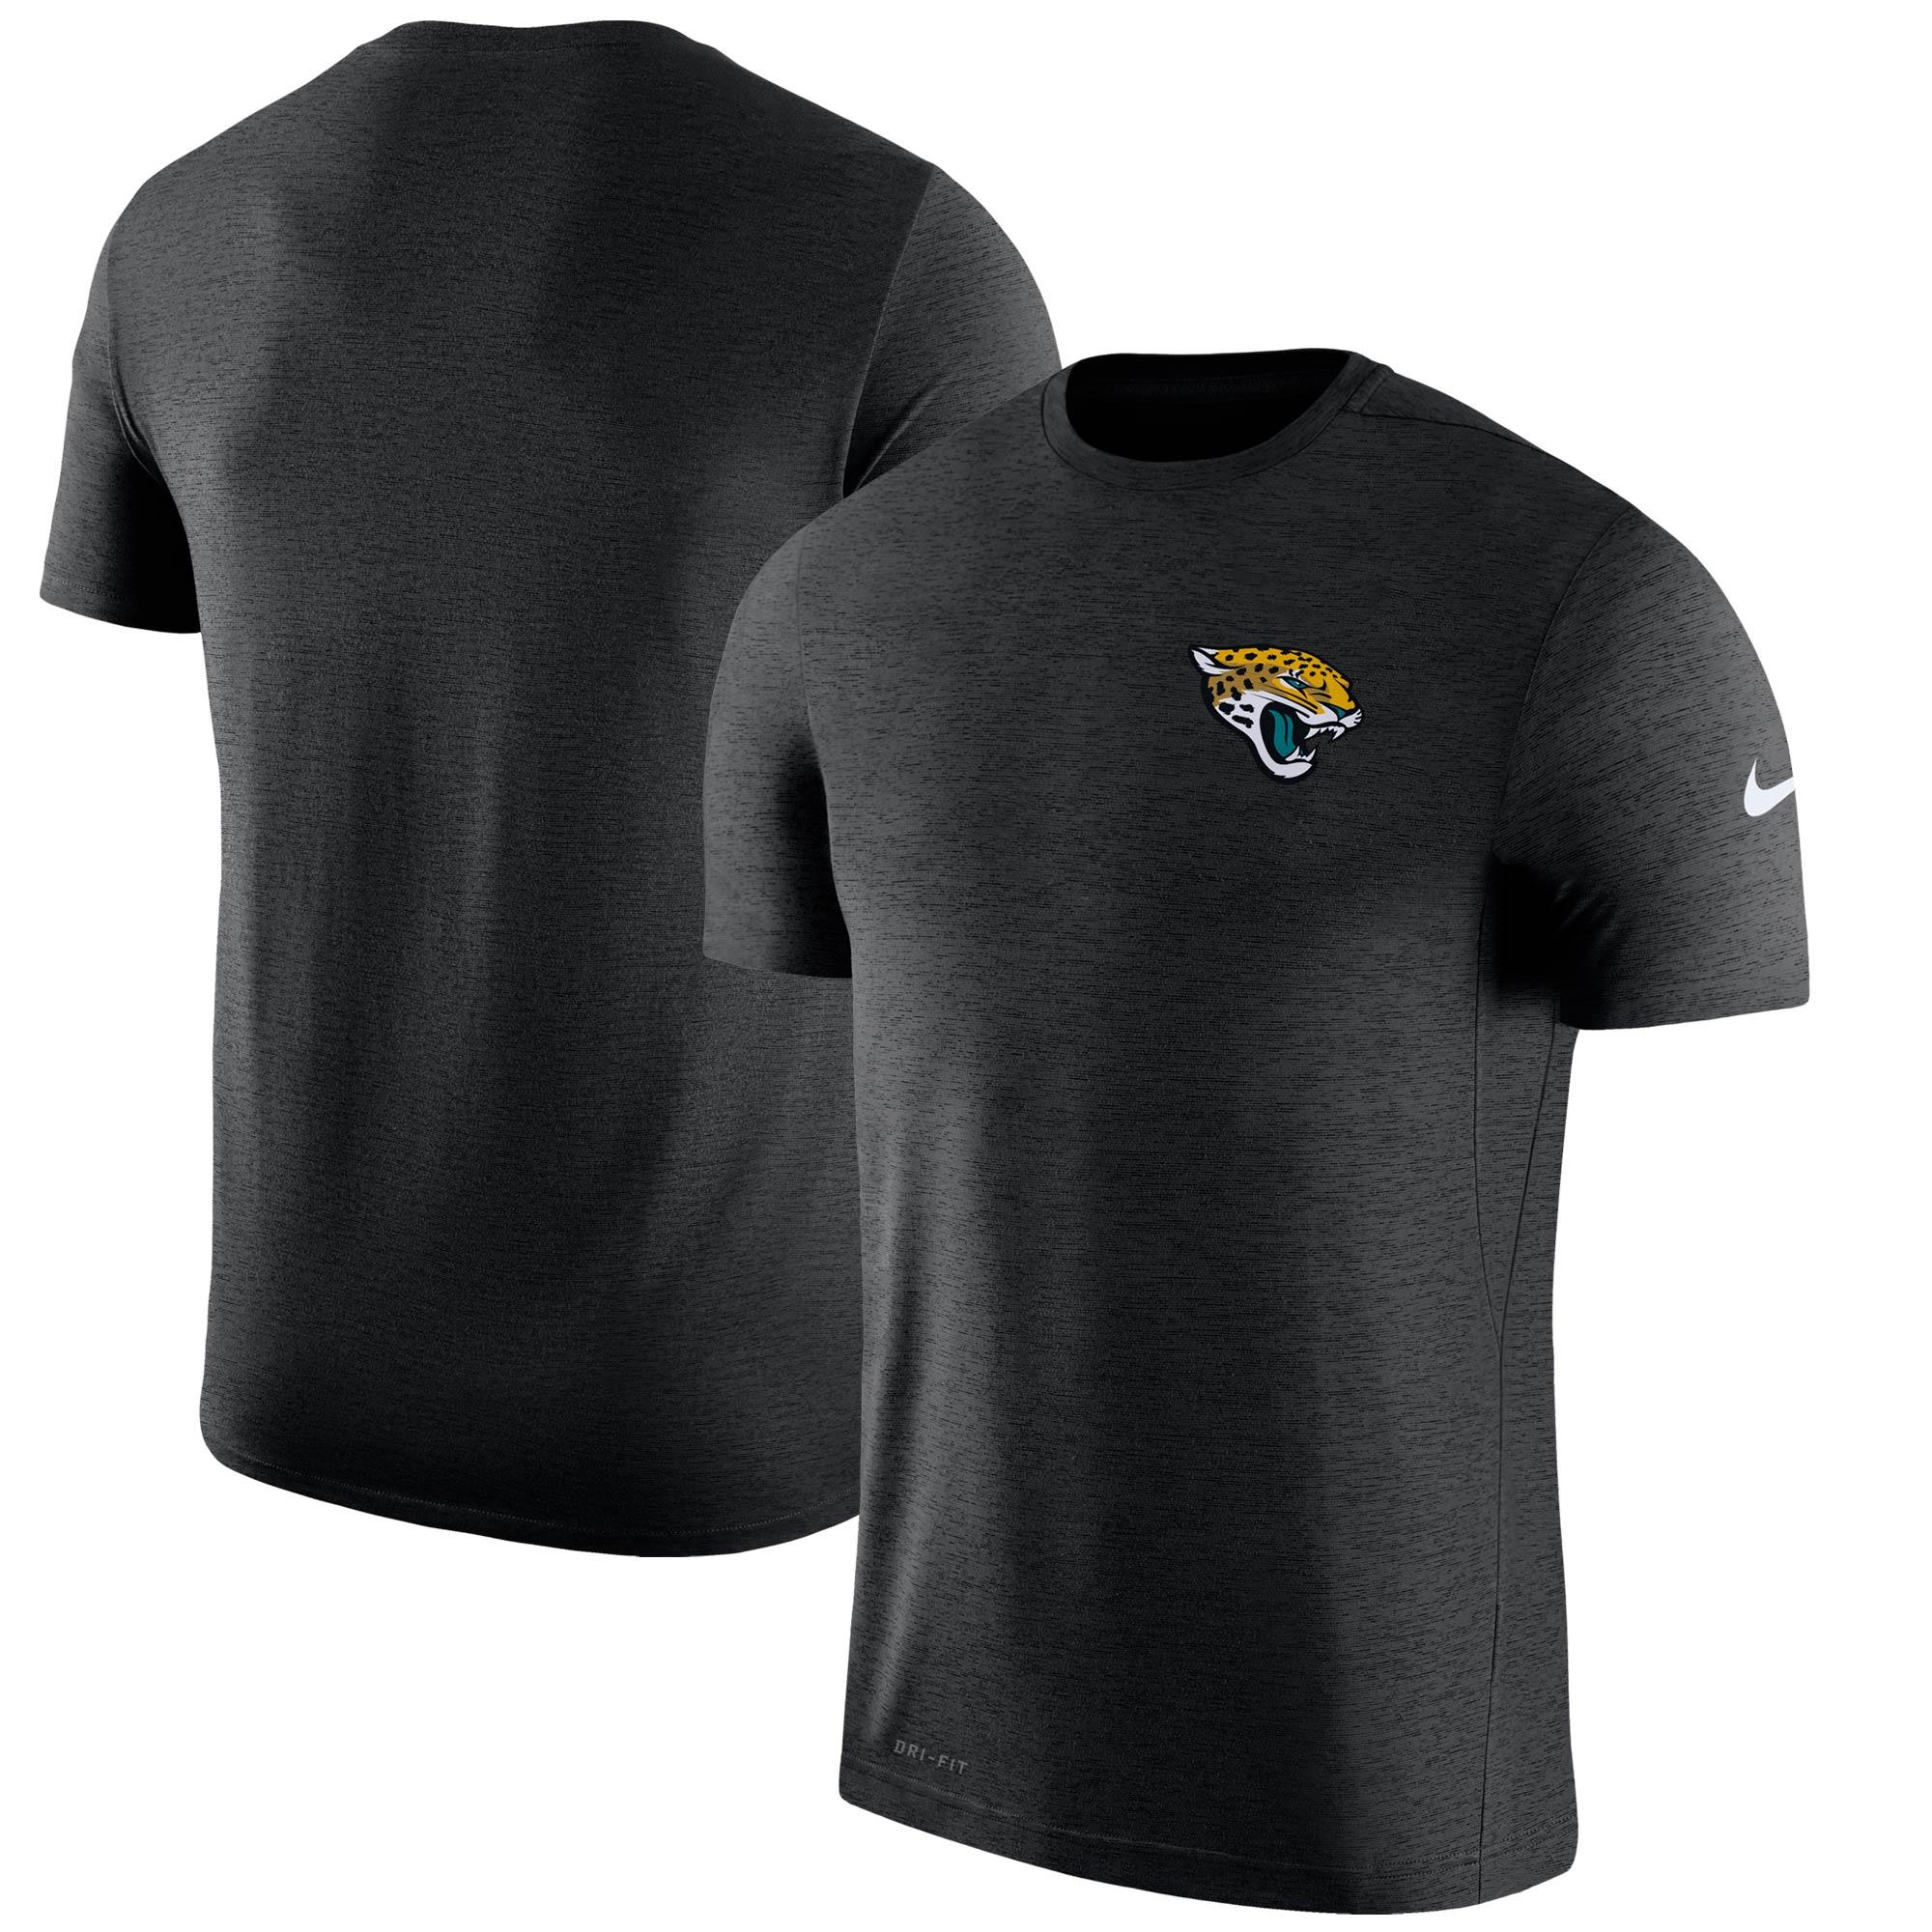 Jacksonville Jaguars Nike Sideline Coaches T-Shirt - Black